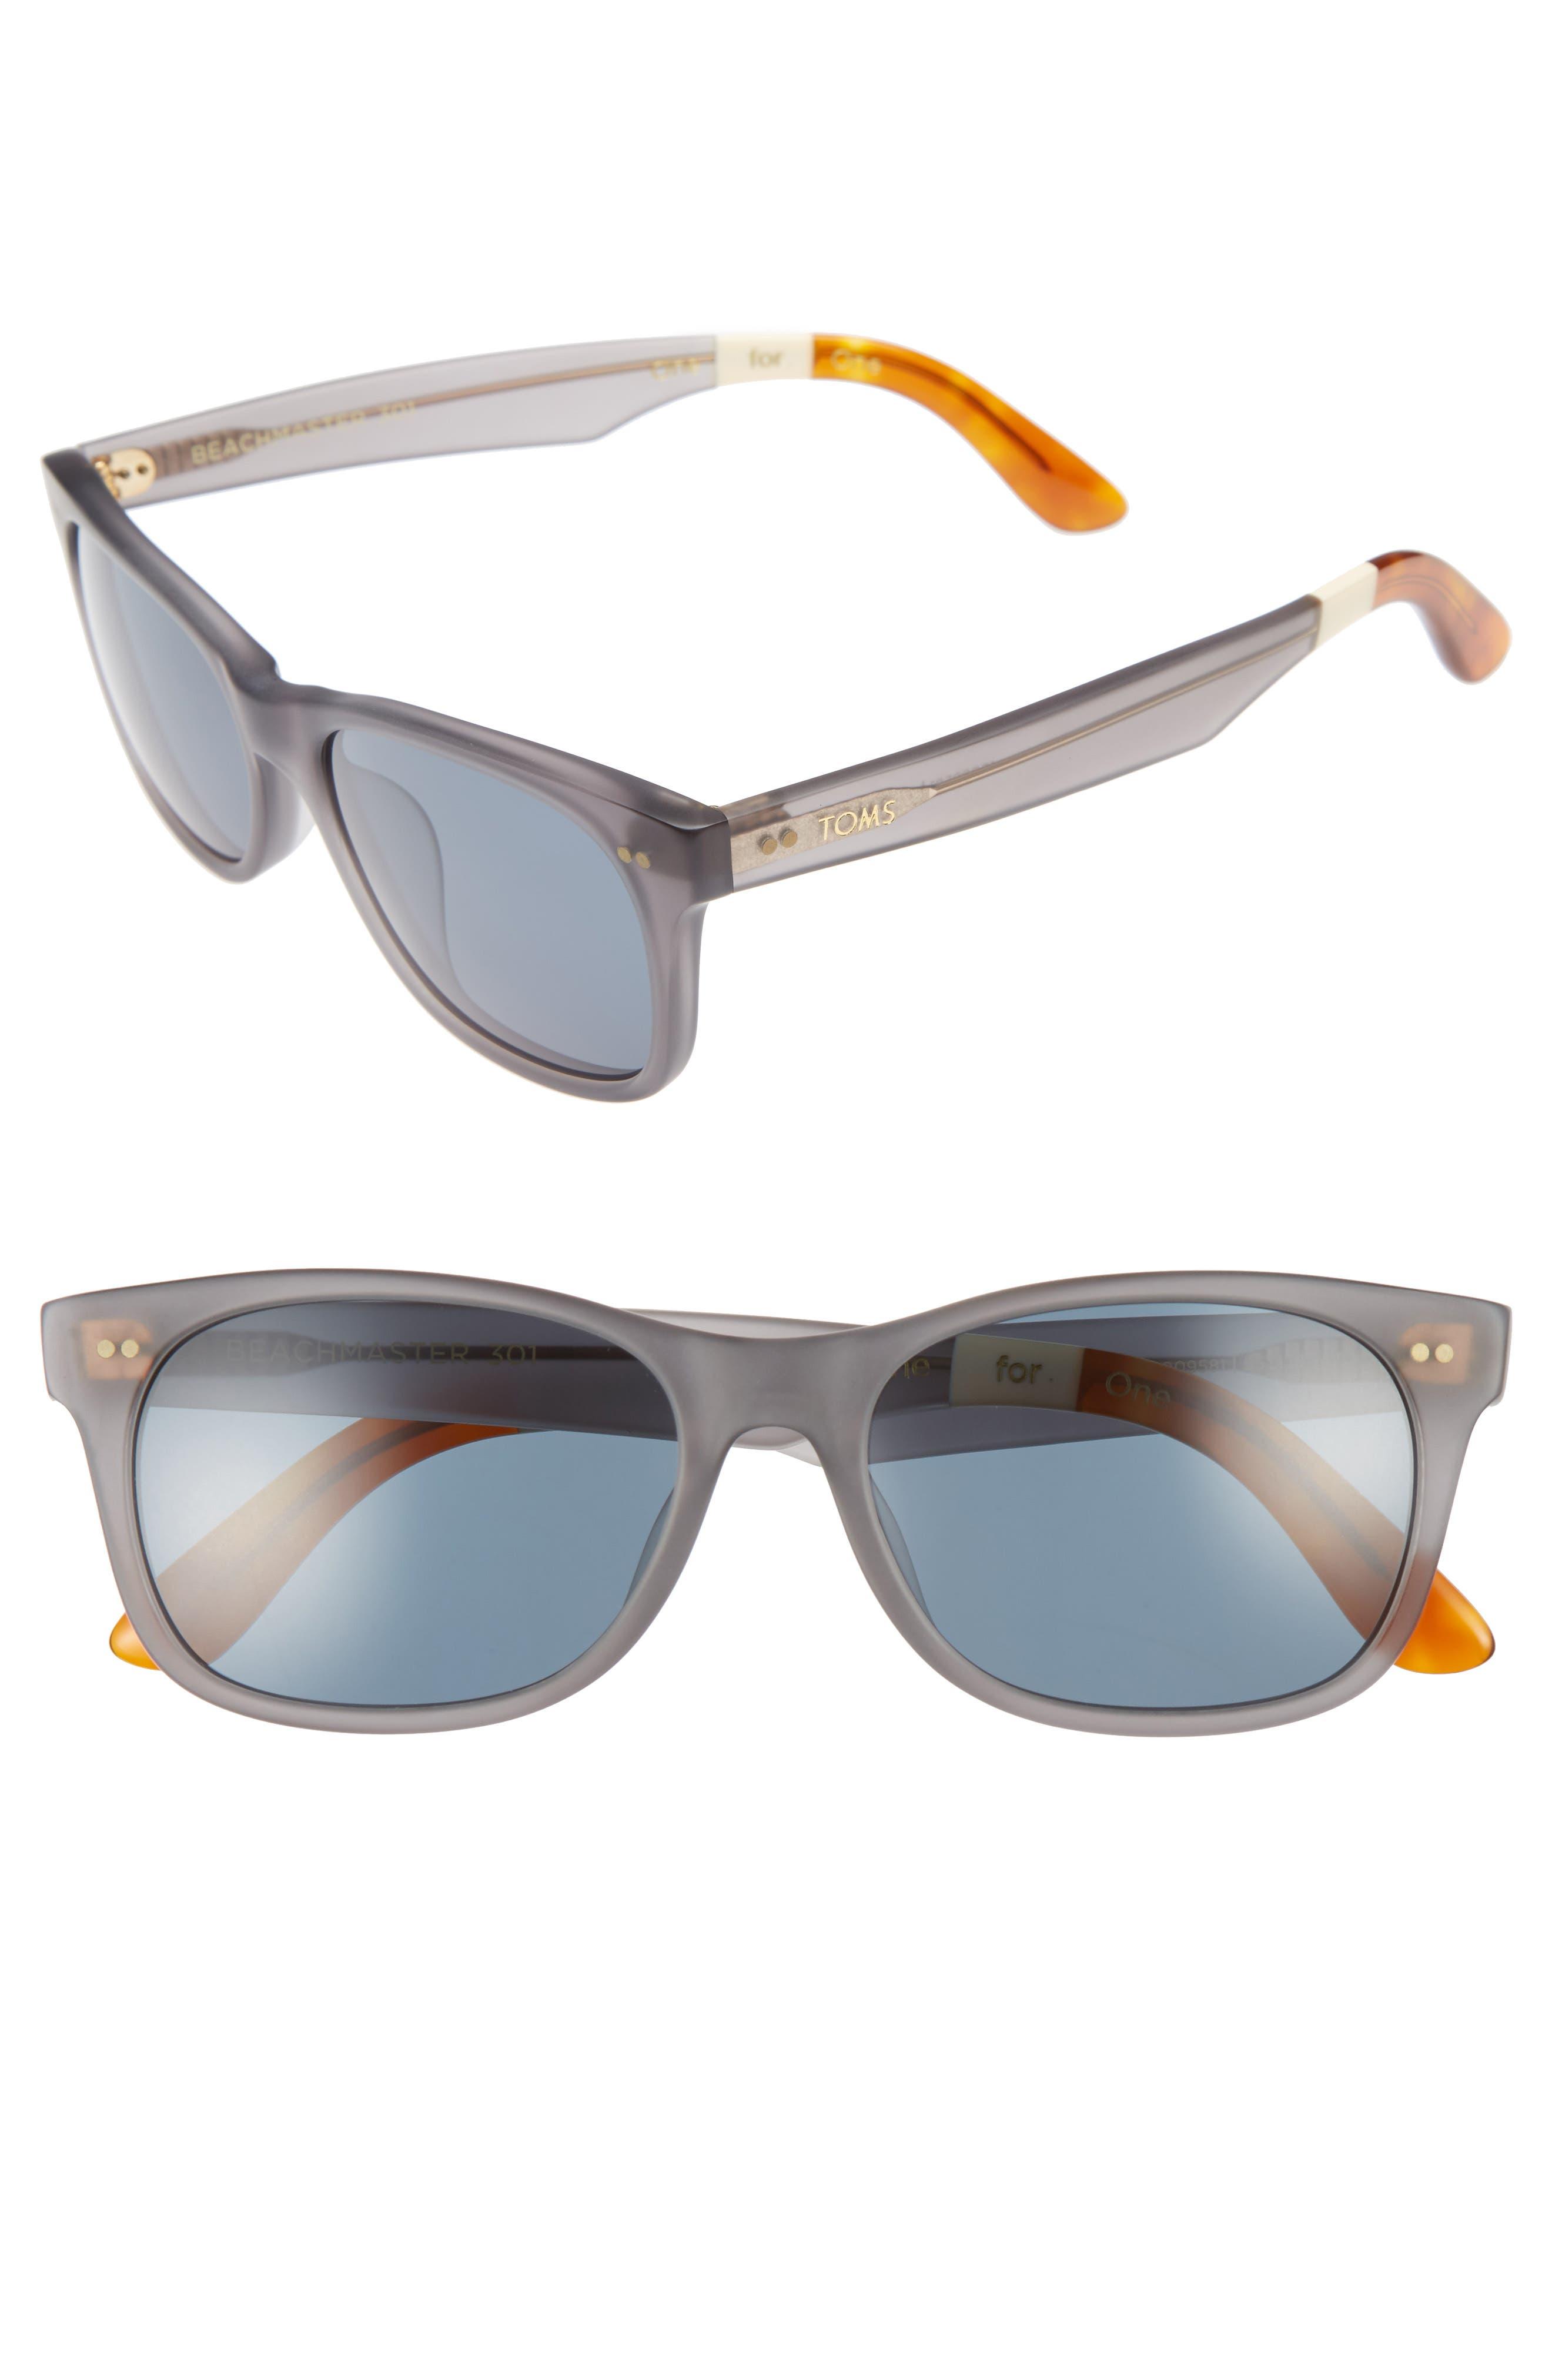 Beachmaster 55mm Sunglasses,                             Main thumbnail 1, color,                             030